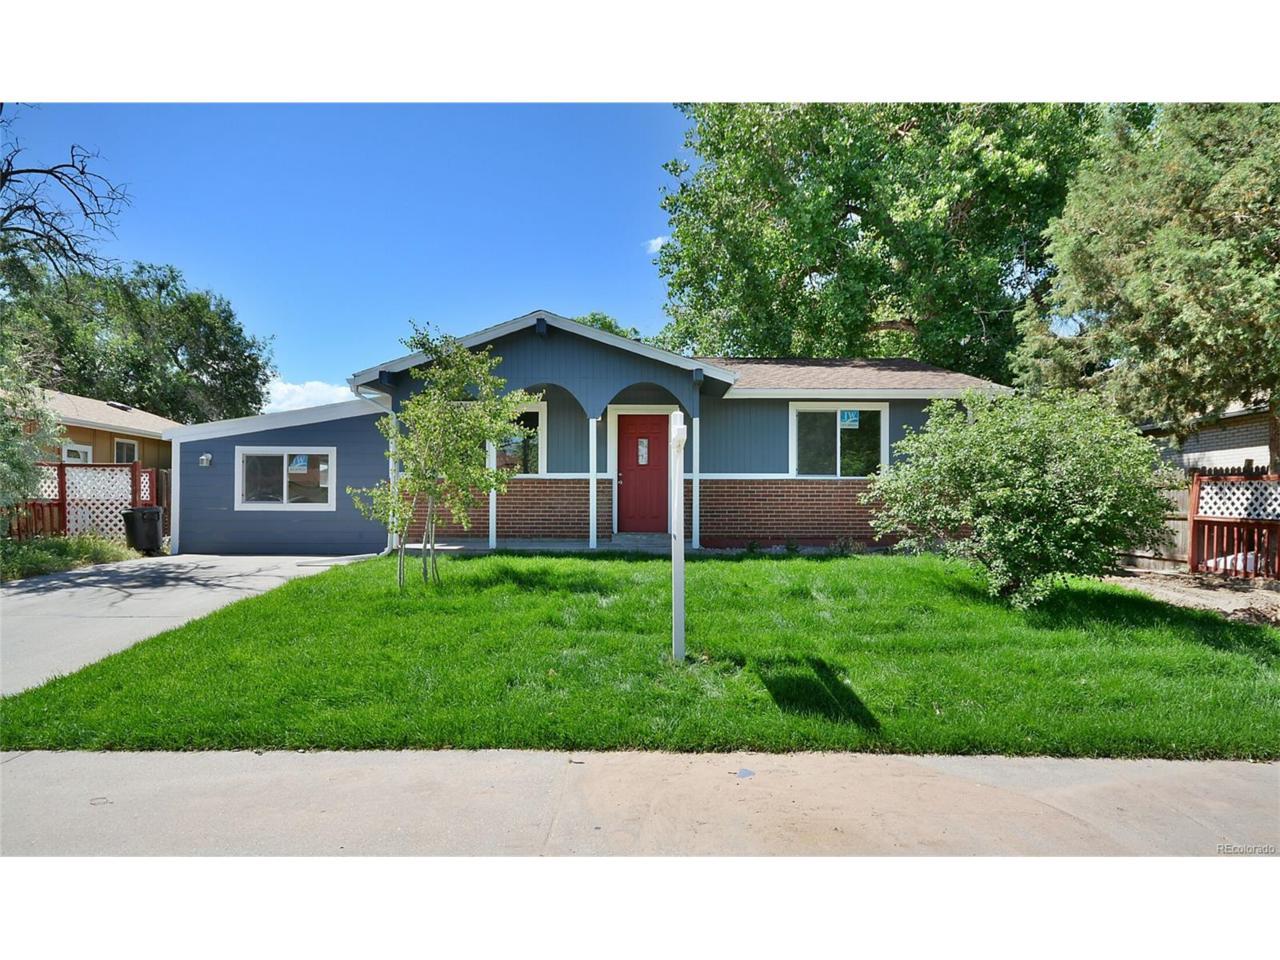 5315 Billings Street, Denver, CO 80239 (MLS #8987596) :: 8z Real Estate